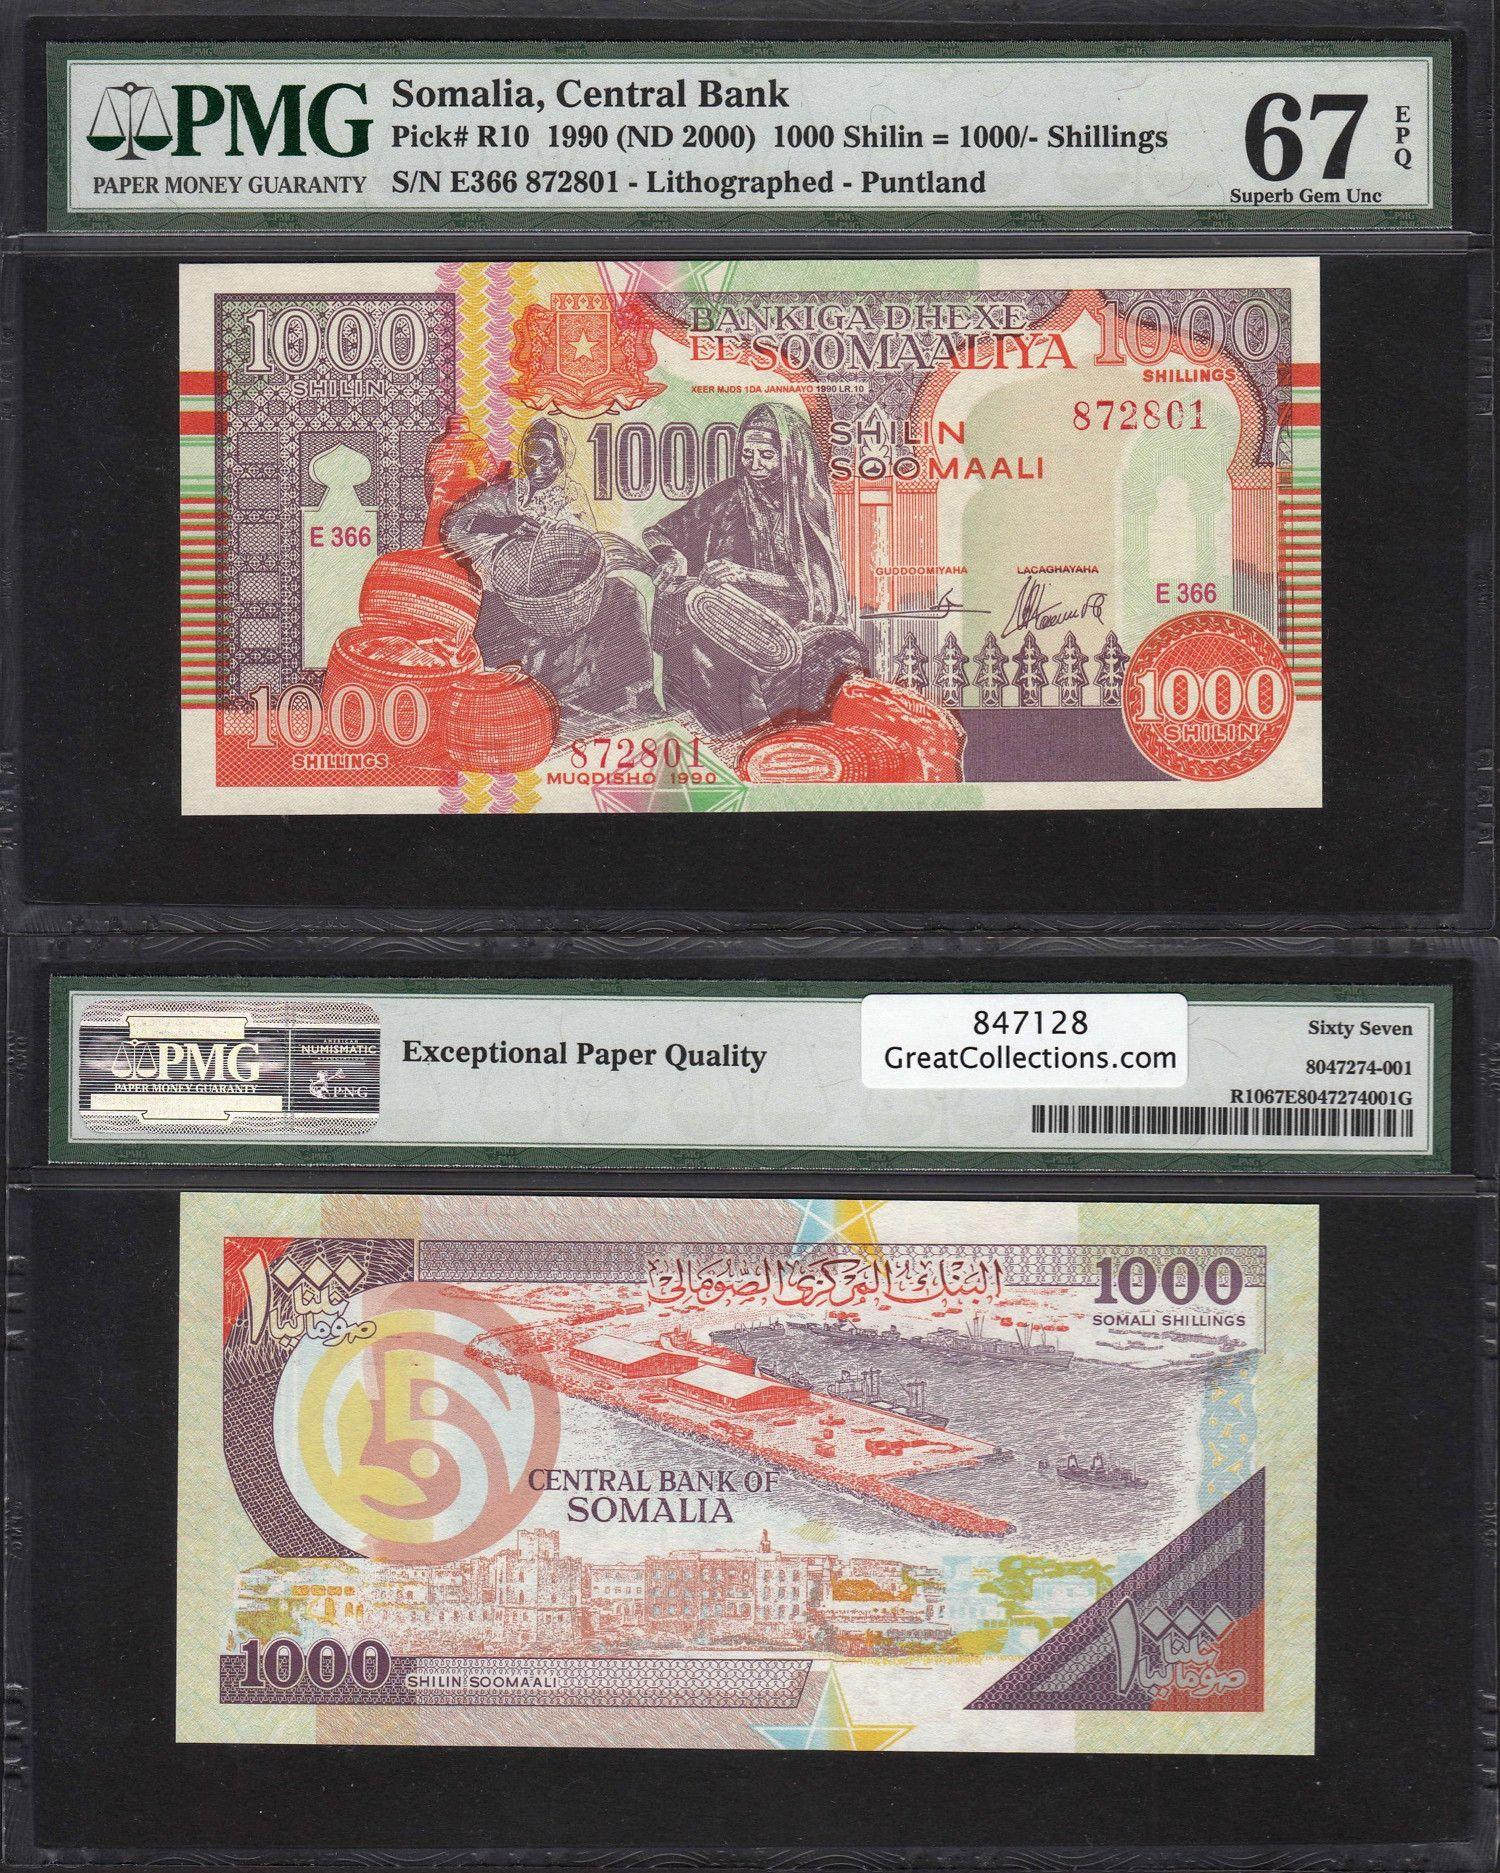 2000 P R10 SUPERB GEM UNC PMG 67 EPQ SOMALIA 1000 1,000 SHILLING 1990